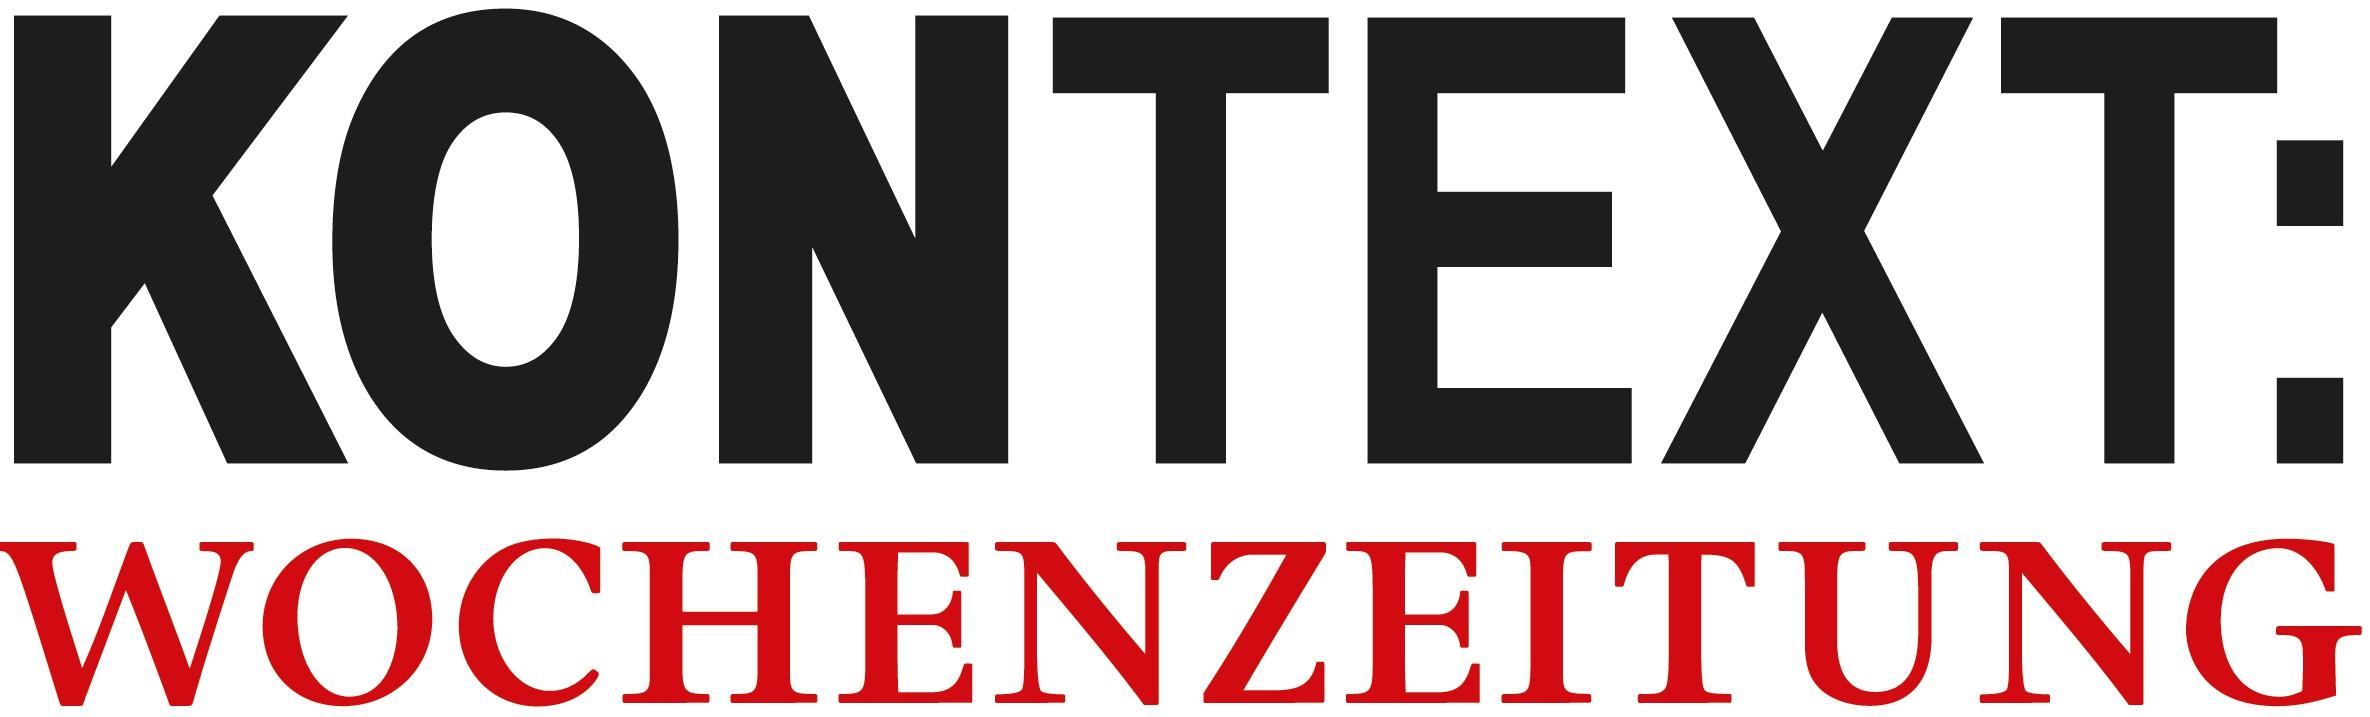 kontext-wochenzeitung-logo-cmyk-beschn